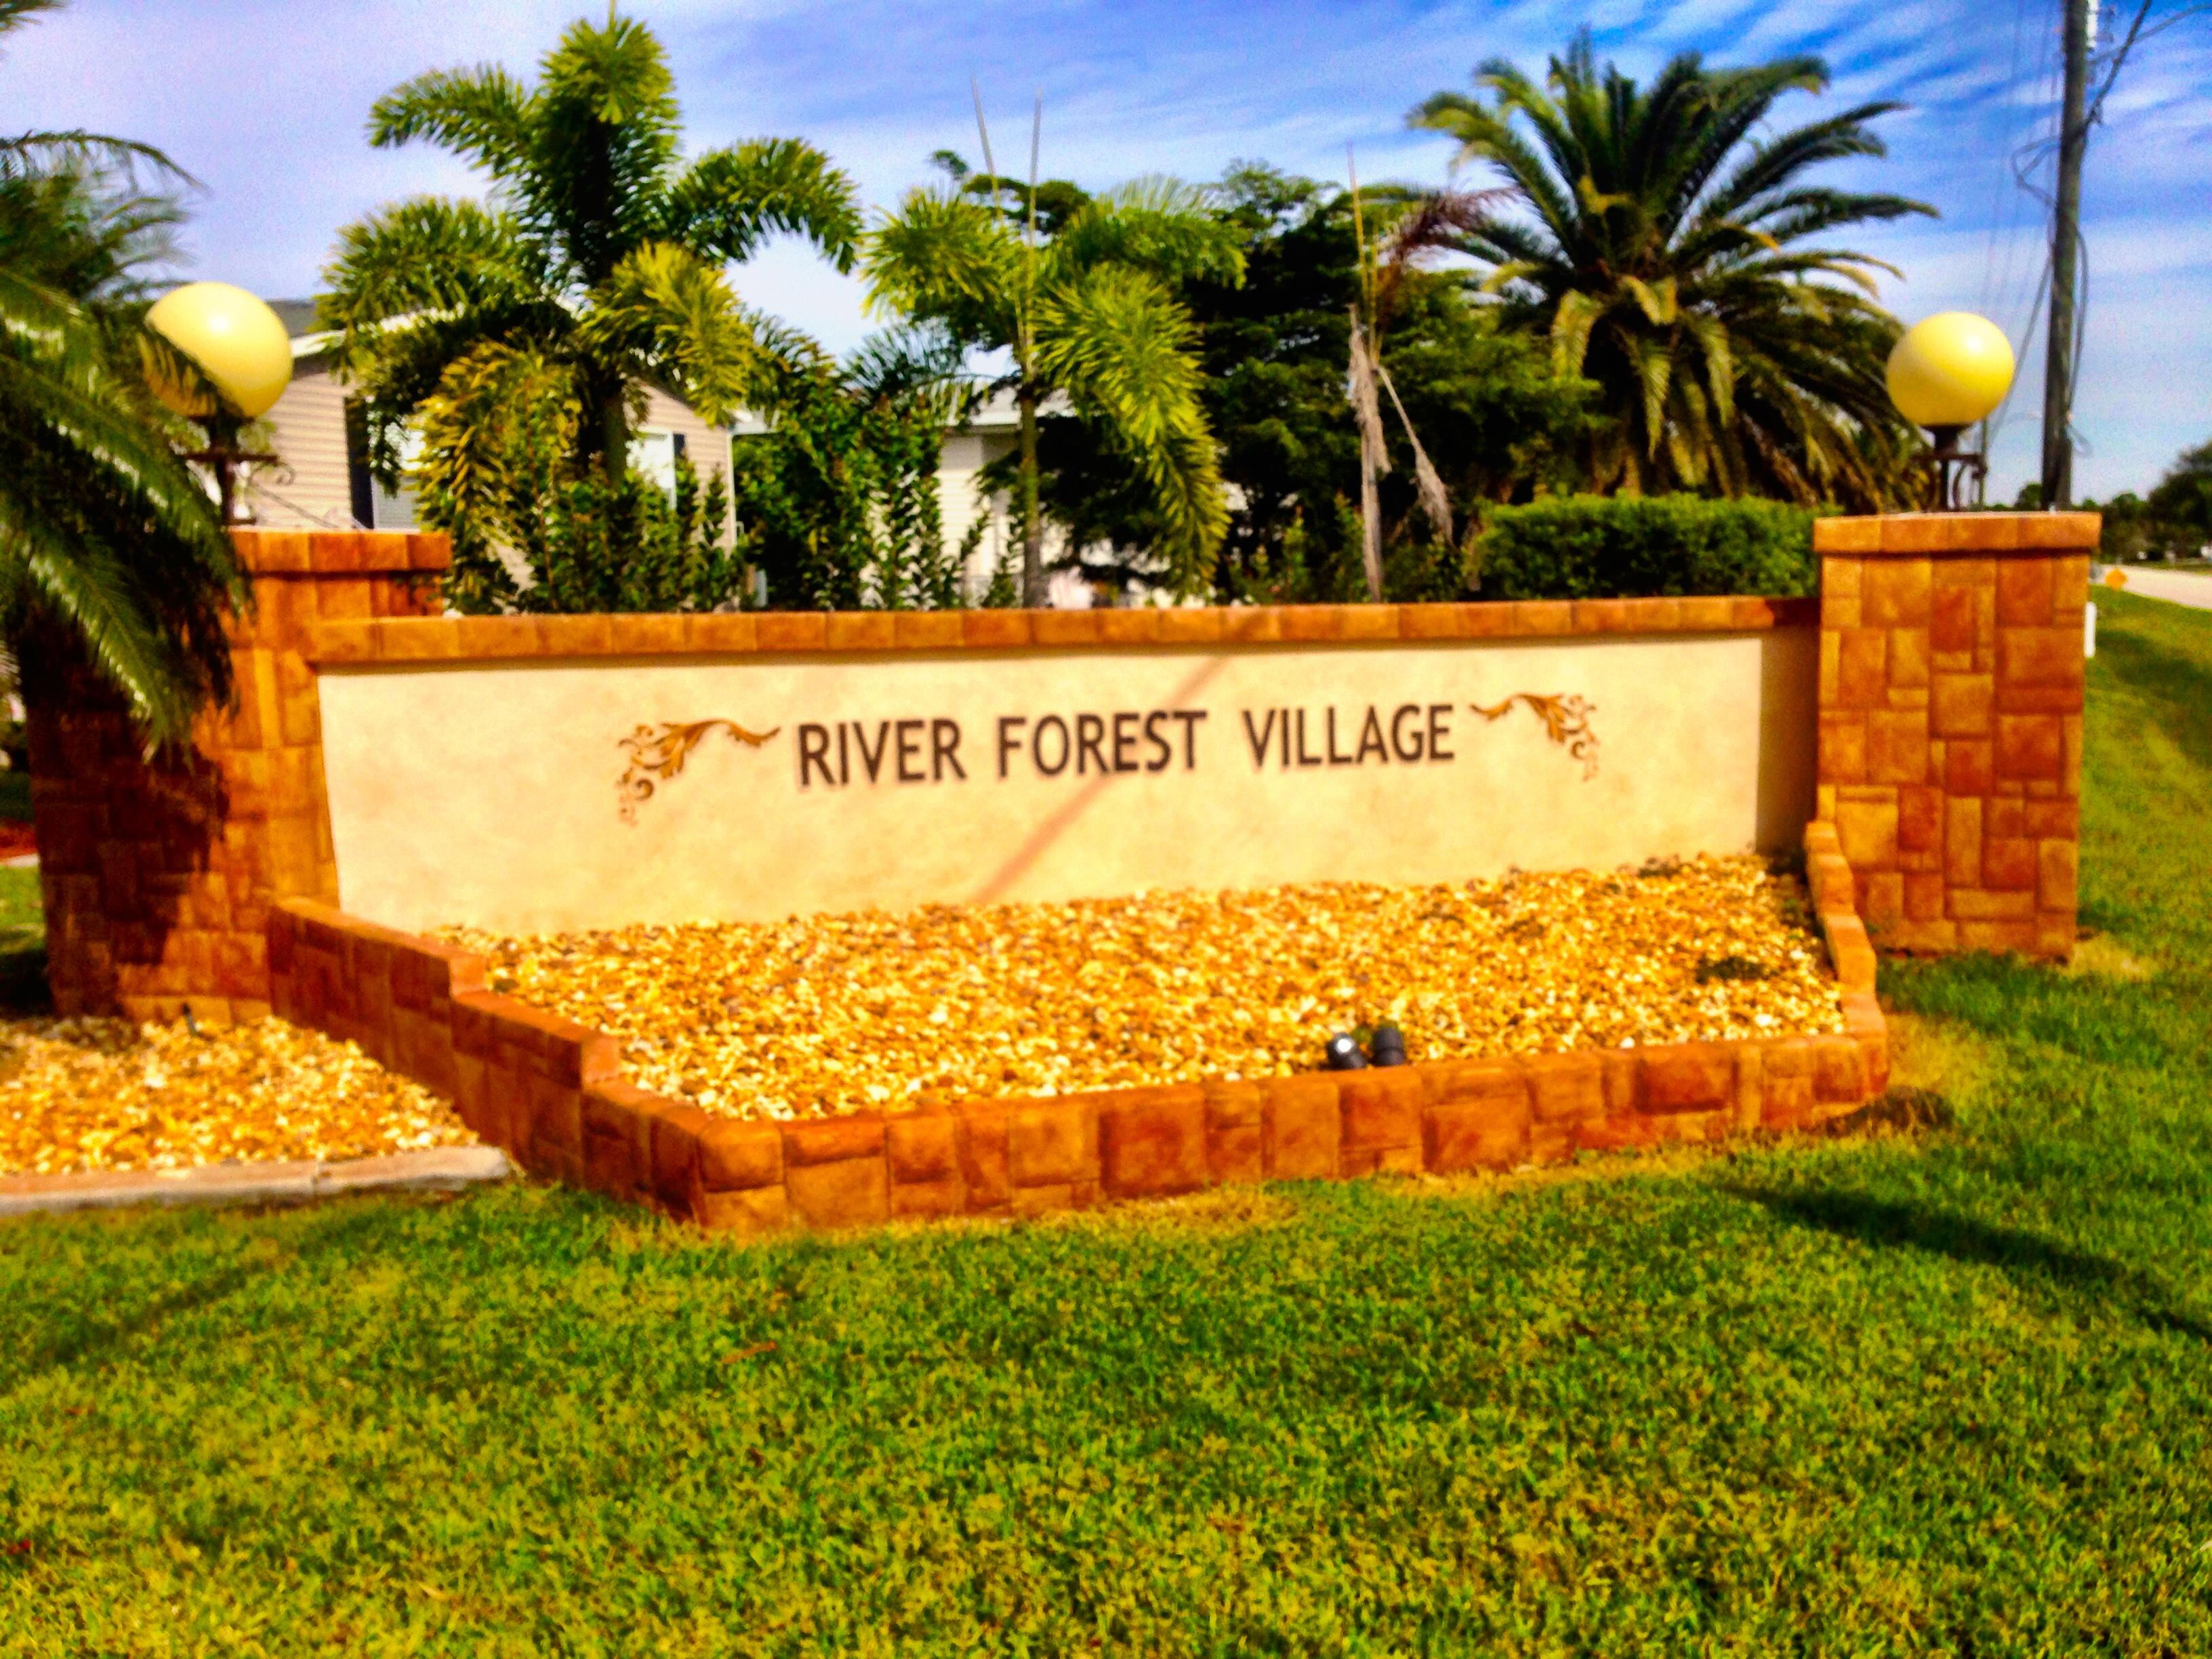 Entrance to River Forest Village